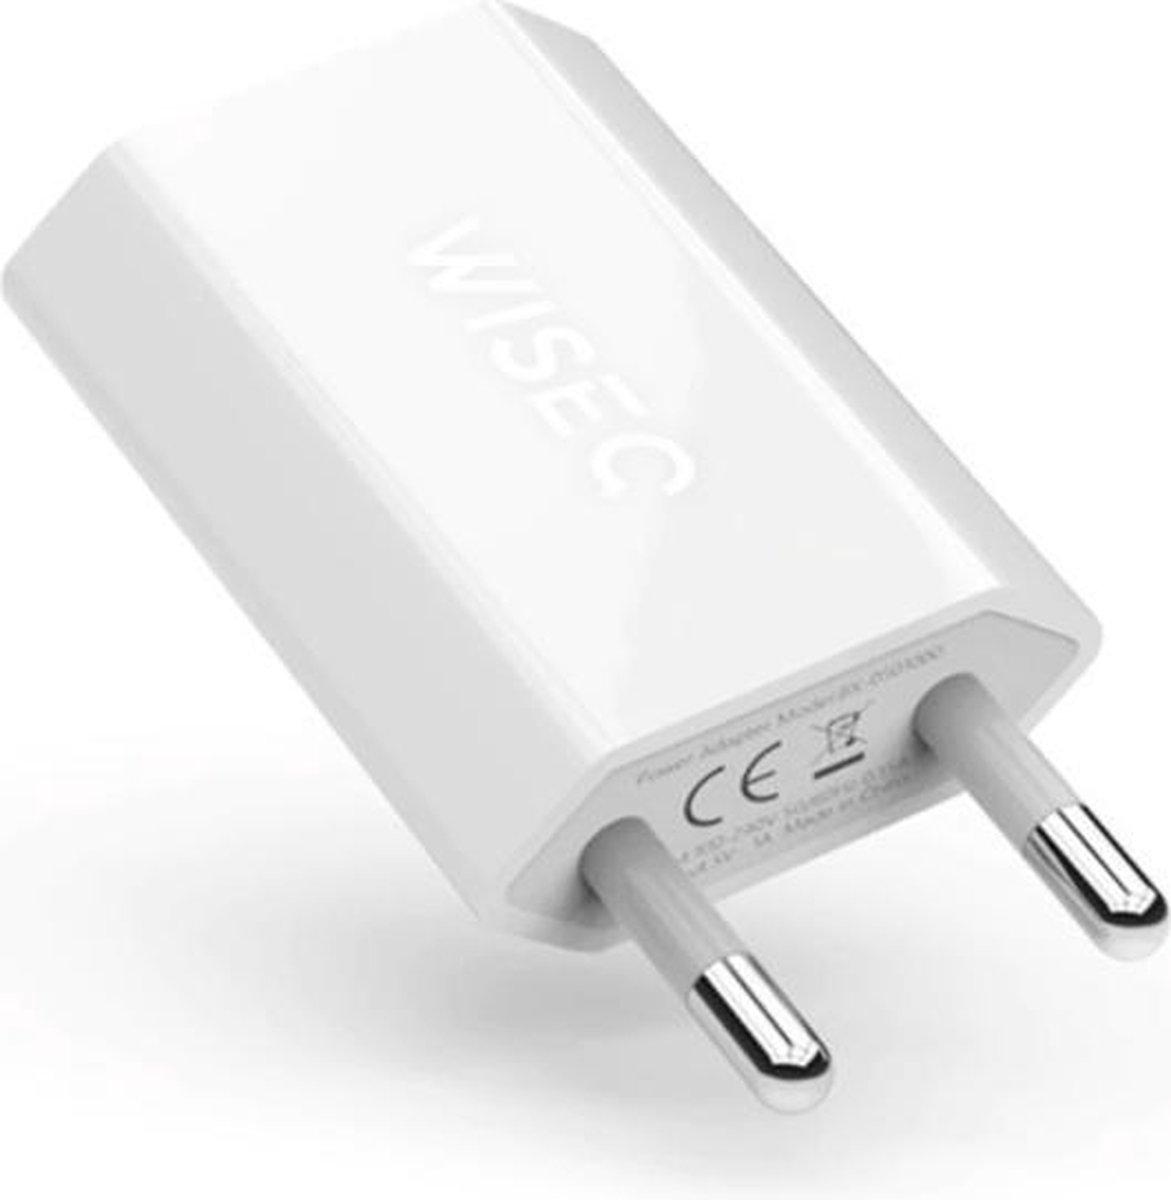 WISEQ - iPhone Lader - Gecertificeerde Oplader USB - Apple iPhone 11/11 PRO/ XS/ XR/ X/ iPhone 8/ 8